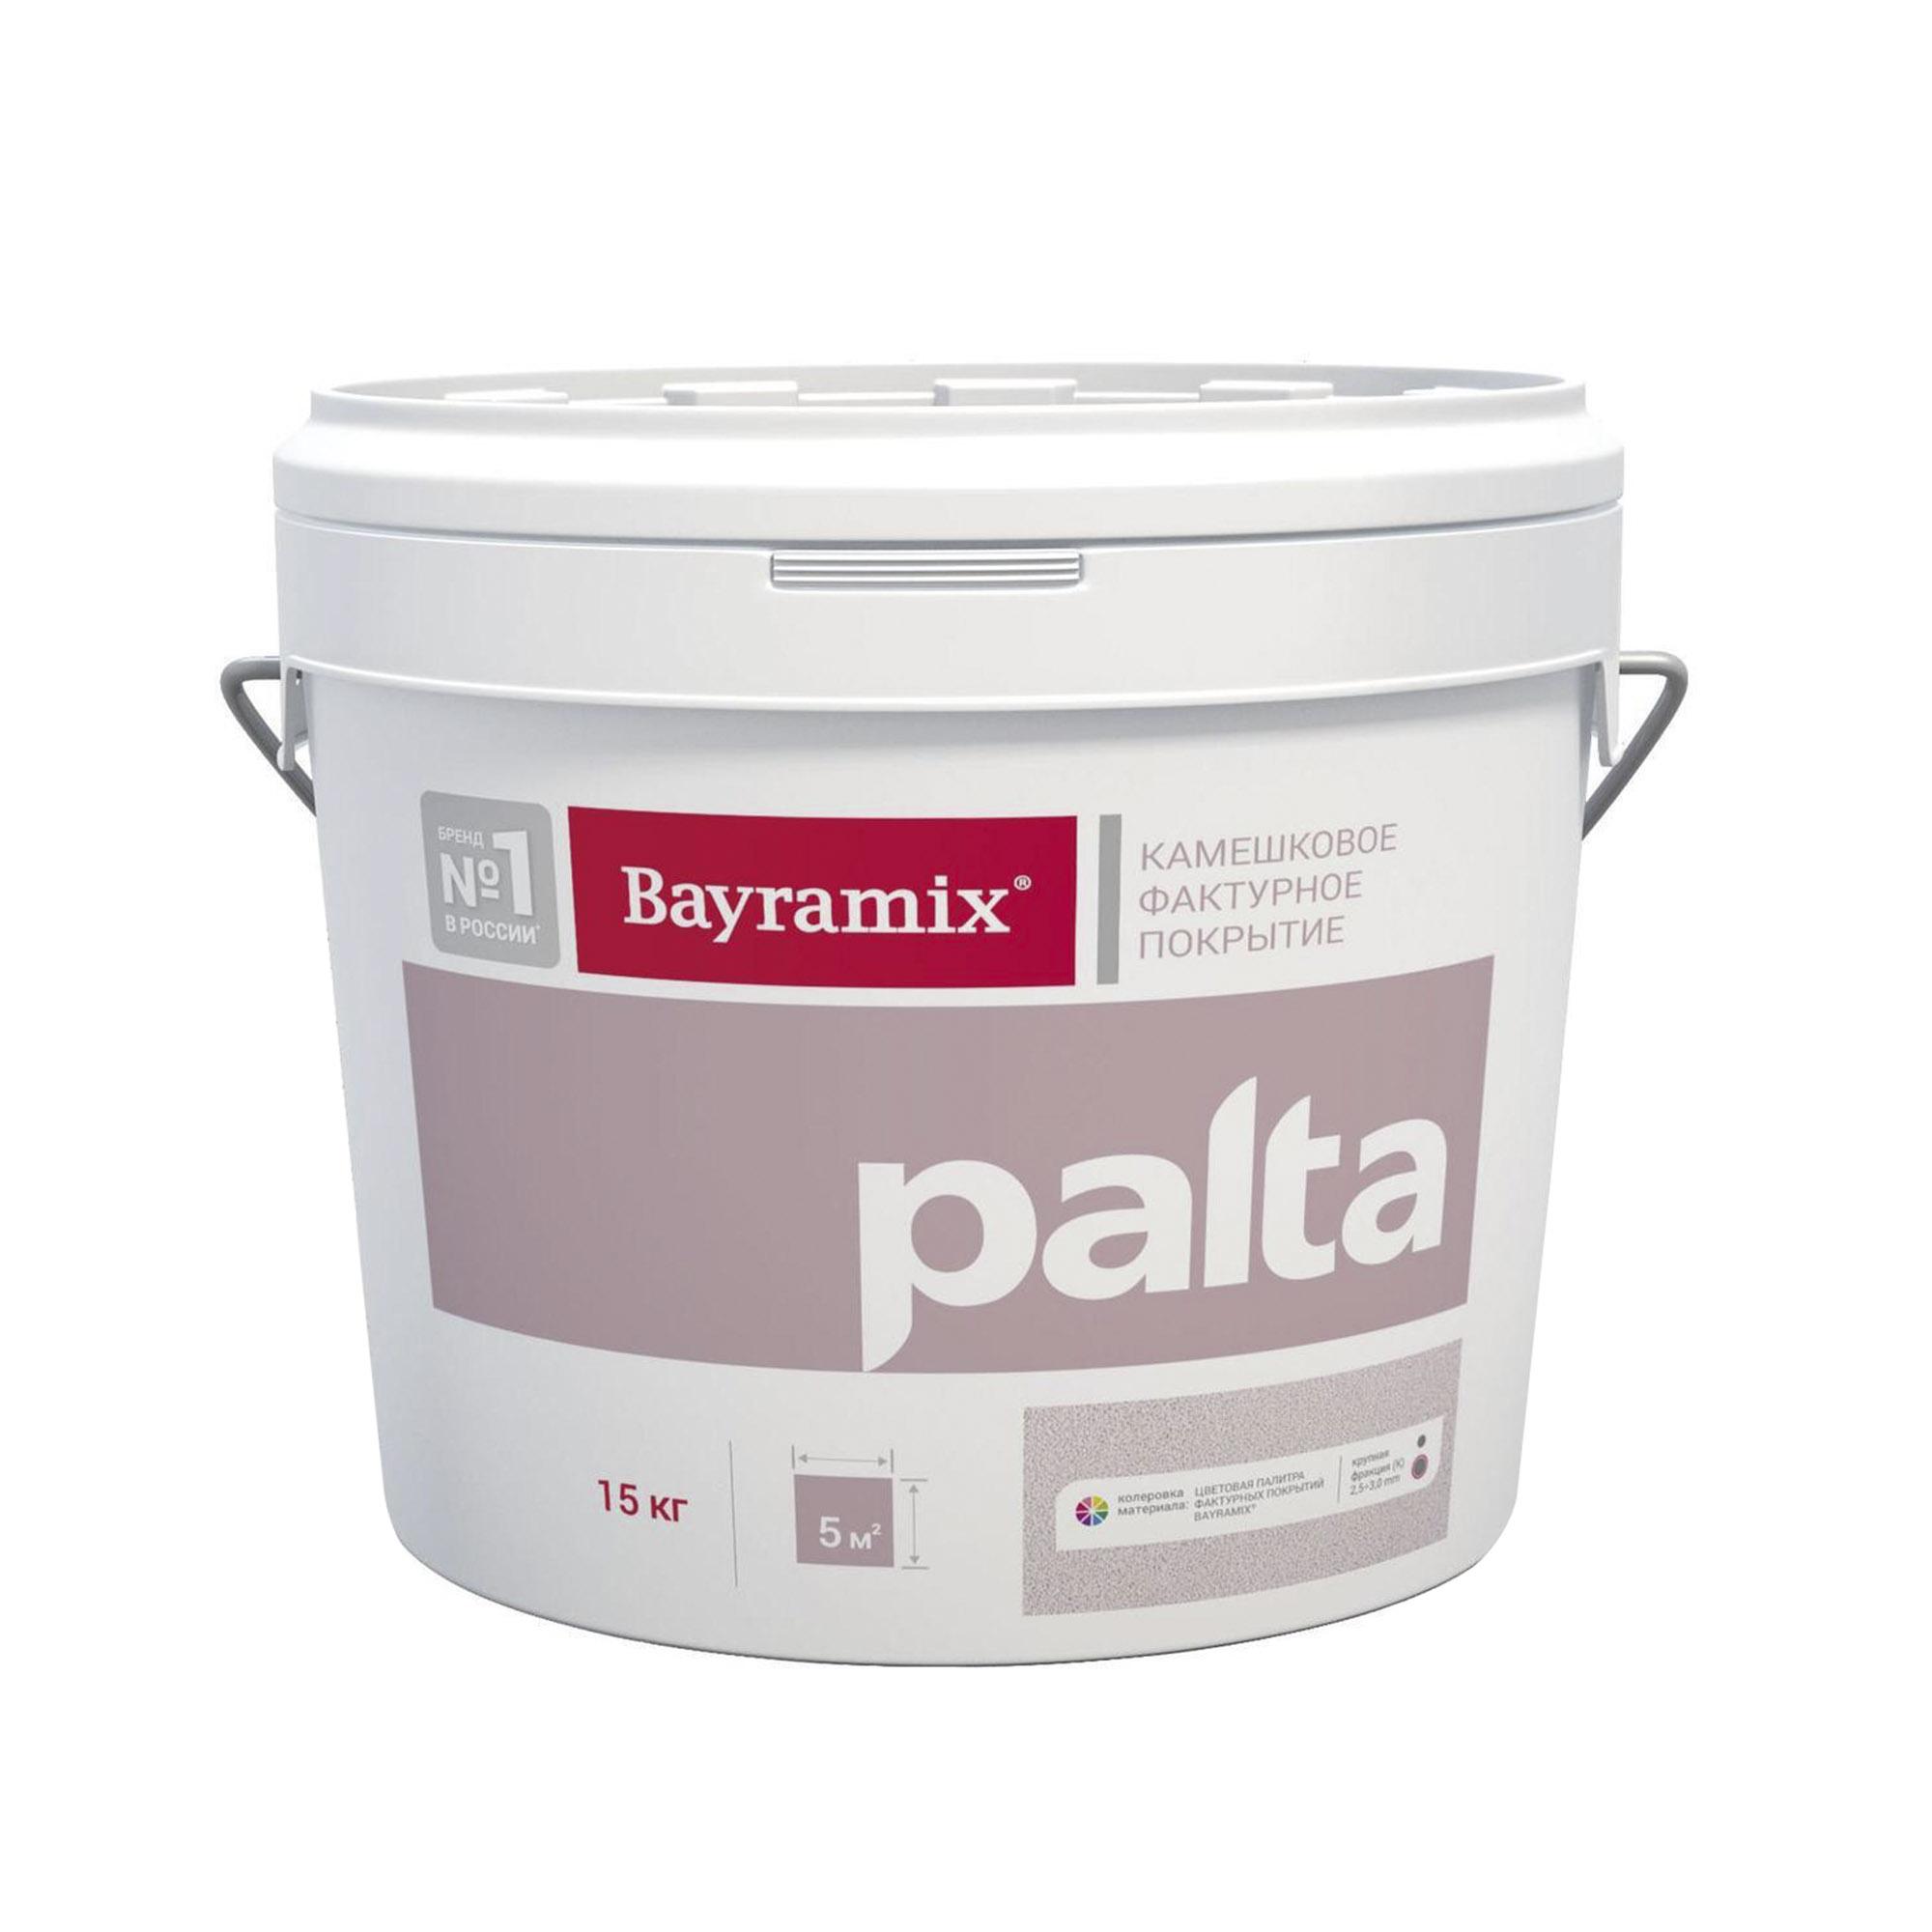 Штукатурка Bayramix Palta P001N средняя 15 кг